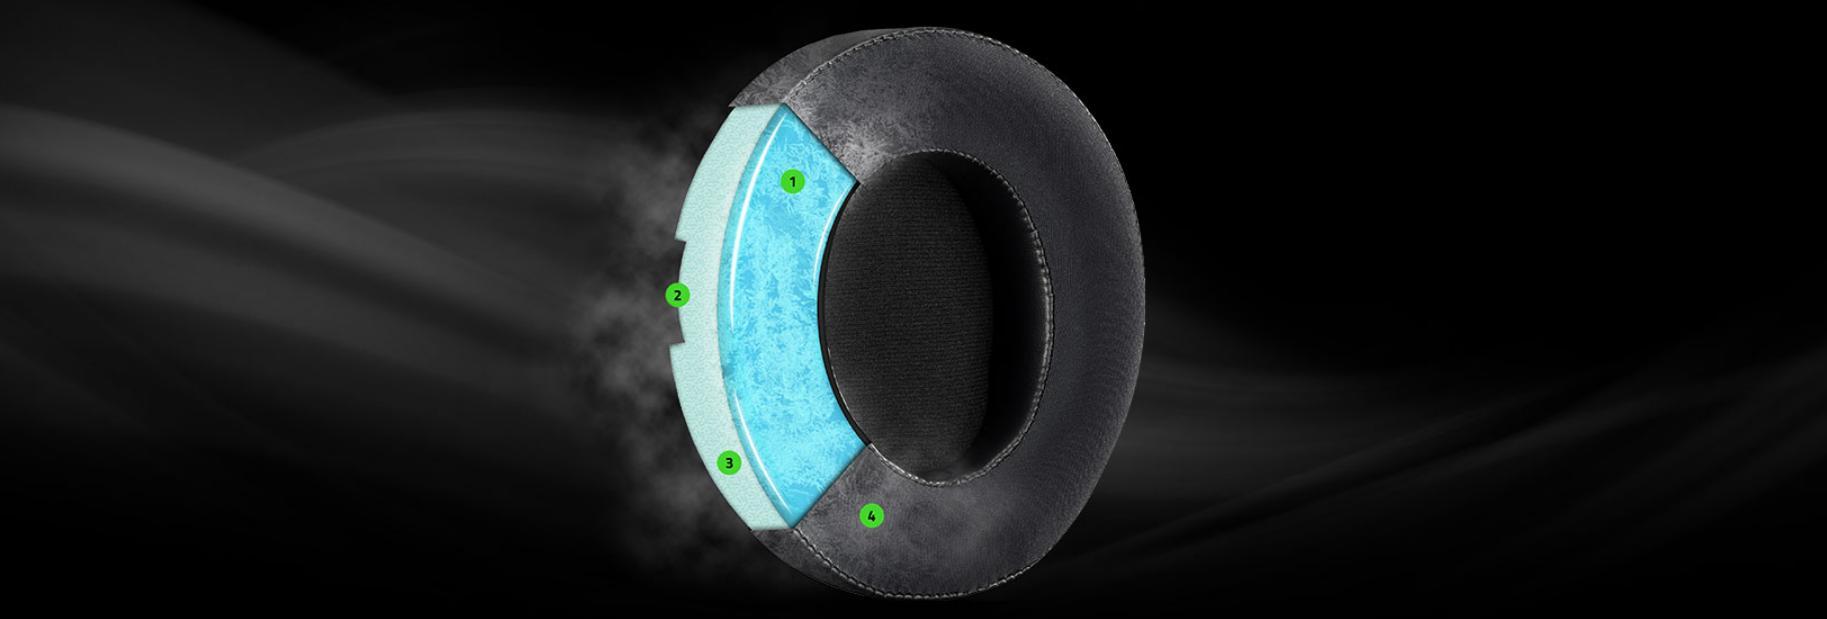 Tai nghe Razer Kraken Multi-Platform Wired Mercury RZ04-02830400-R3M1 đeo thoải mái hàng giờ